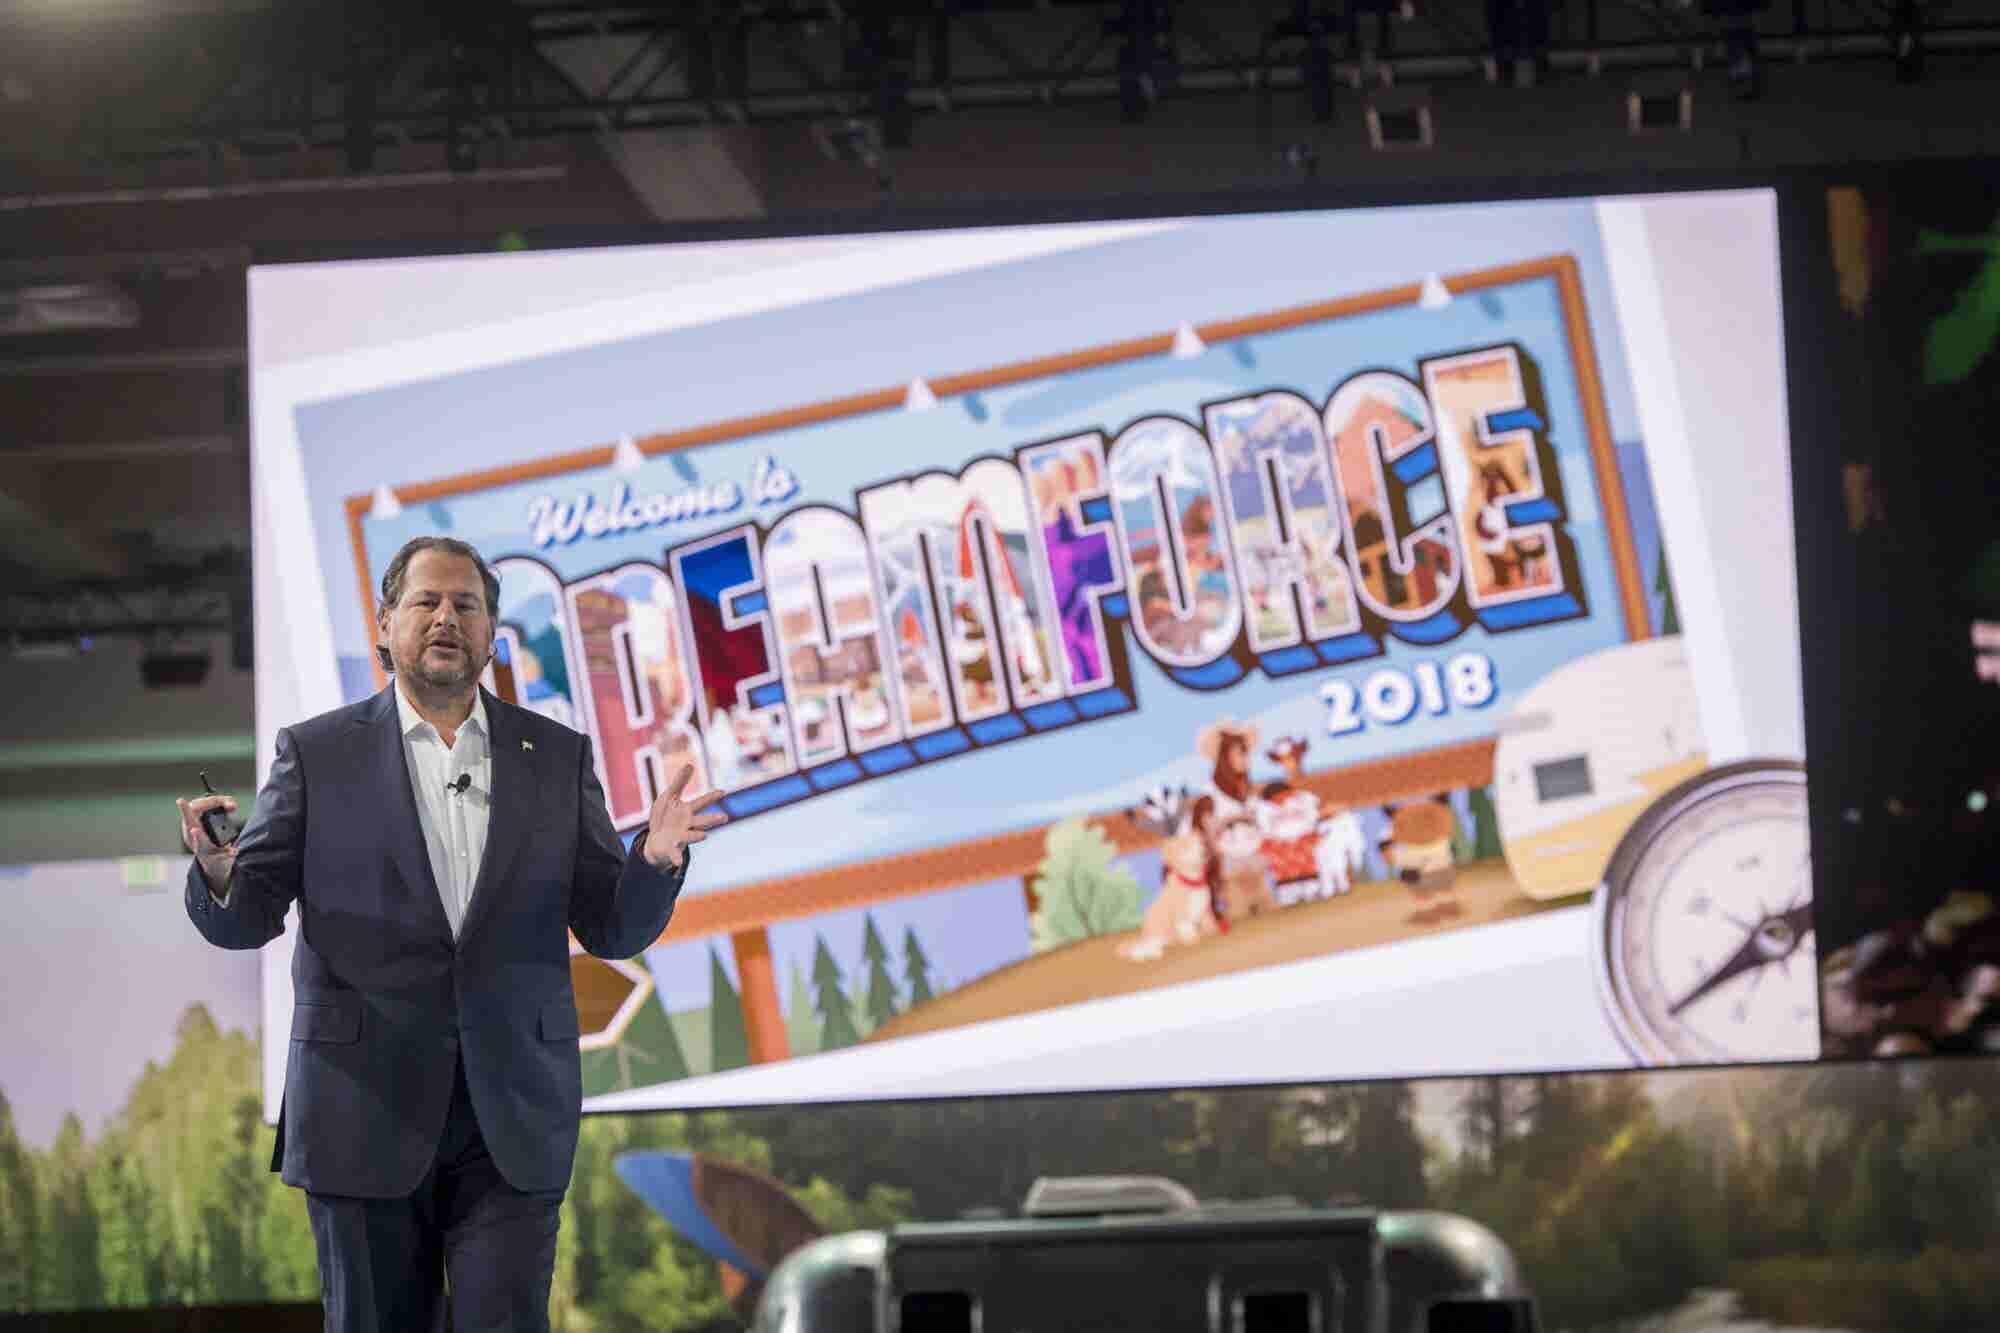 Dreamforce 2018: Connectivity, Sustainability, Values